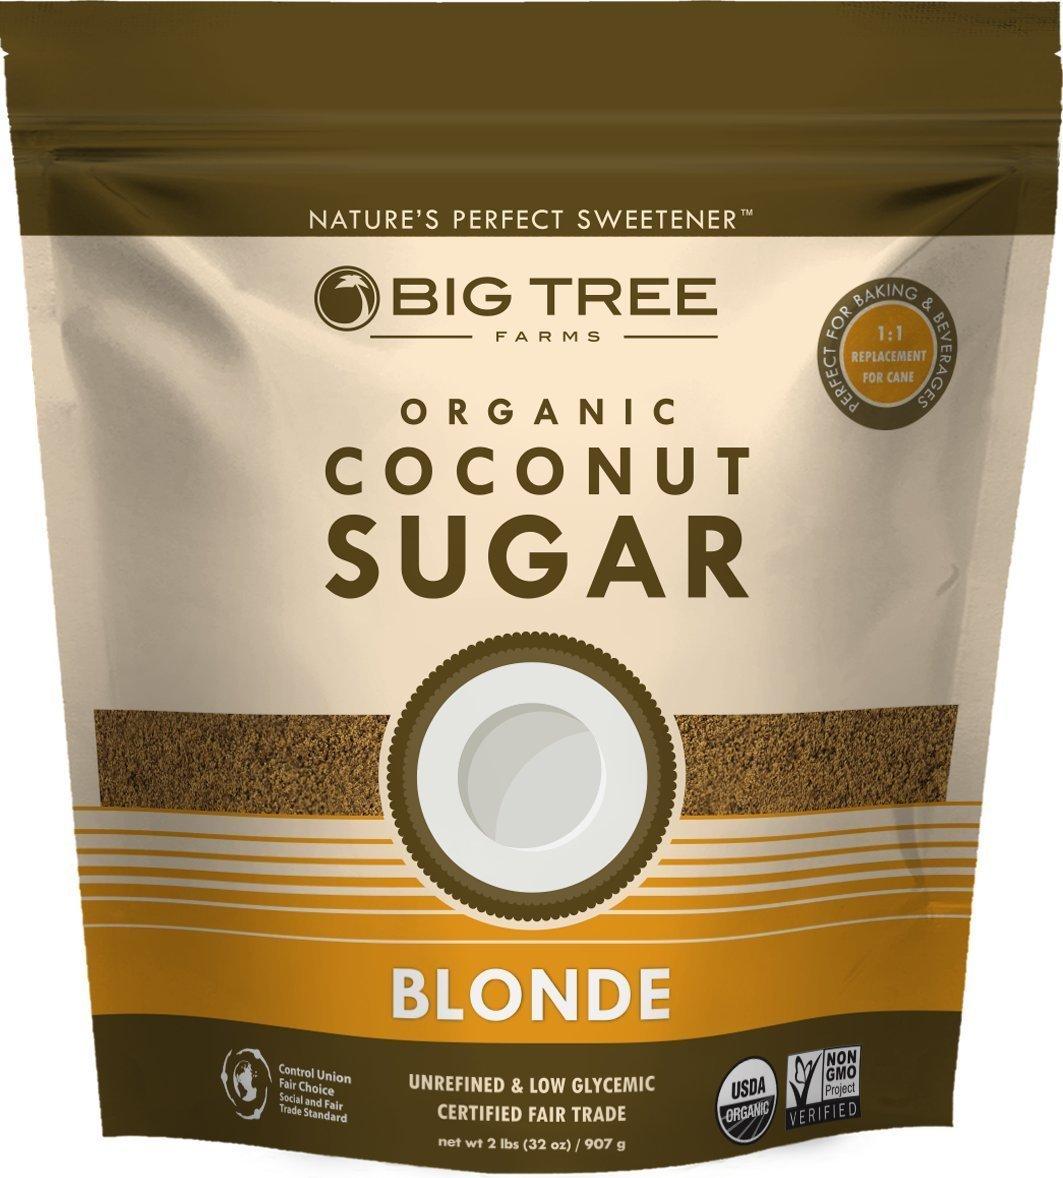 Big Tree Farms Organic Coconut Palm Sugar, Blonde, 2 LB (pack of 2)